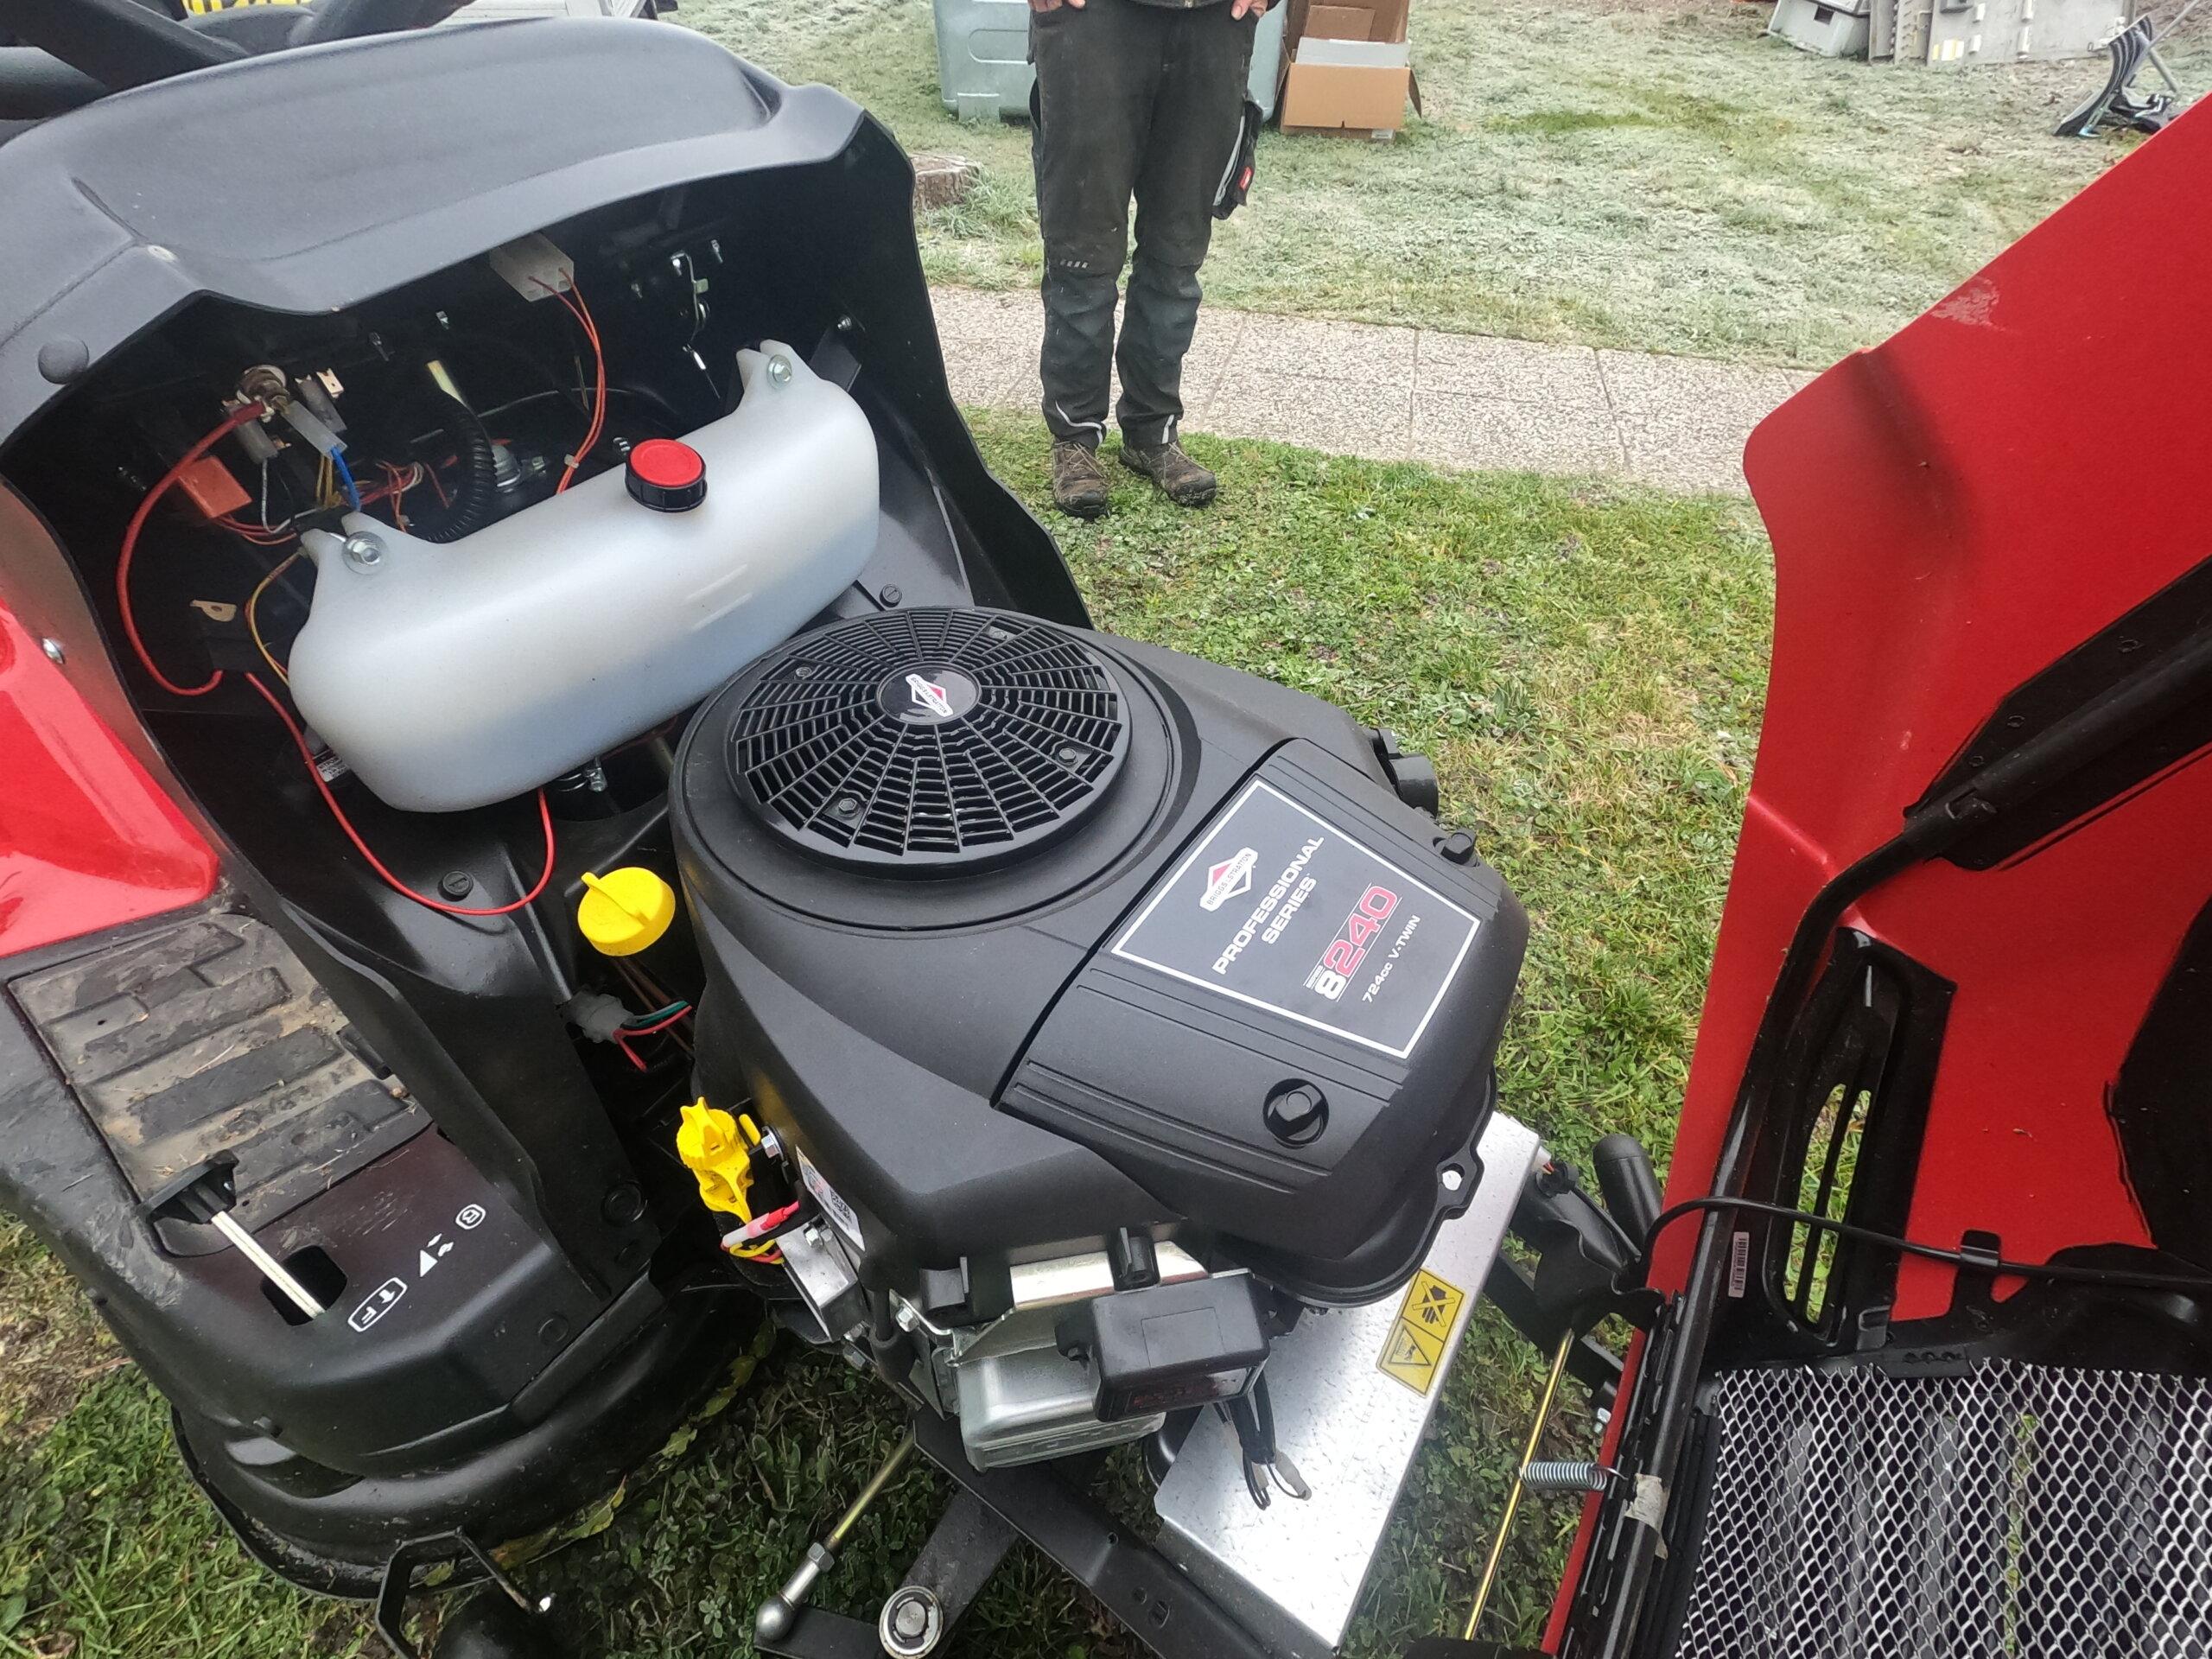 Briggs and Stratton Motor im Herkules Rasentraktor